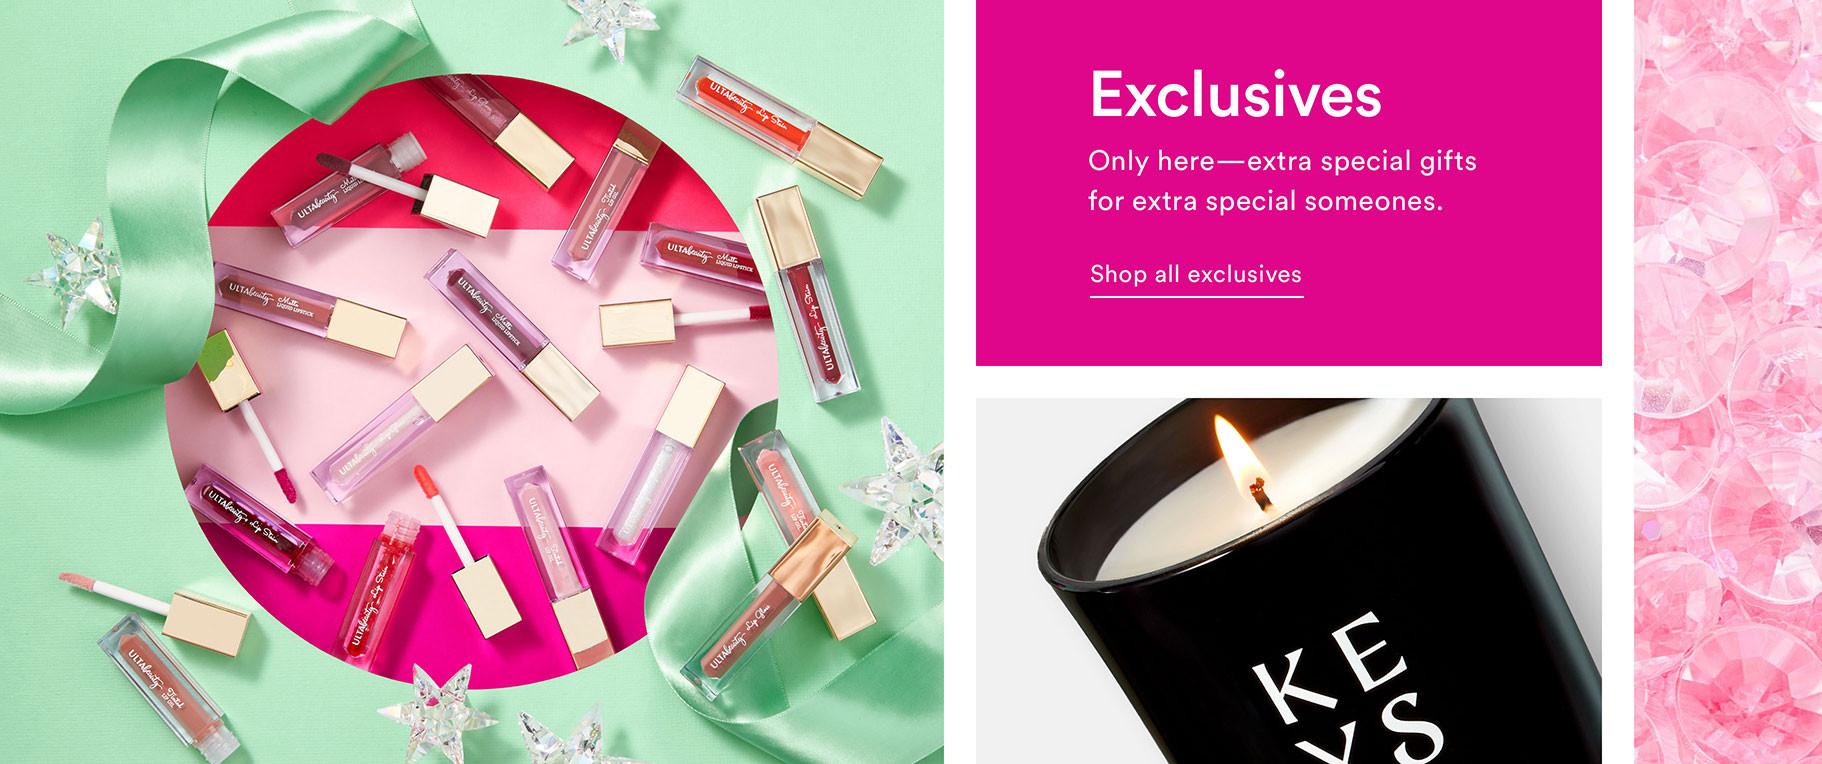 Ulta Beauty Holiday Gift Guide